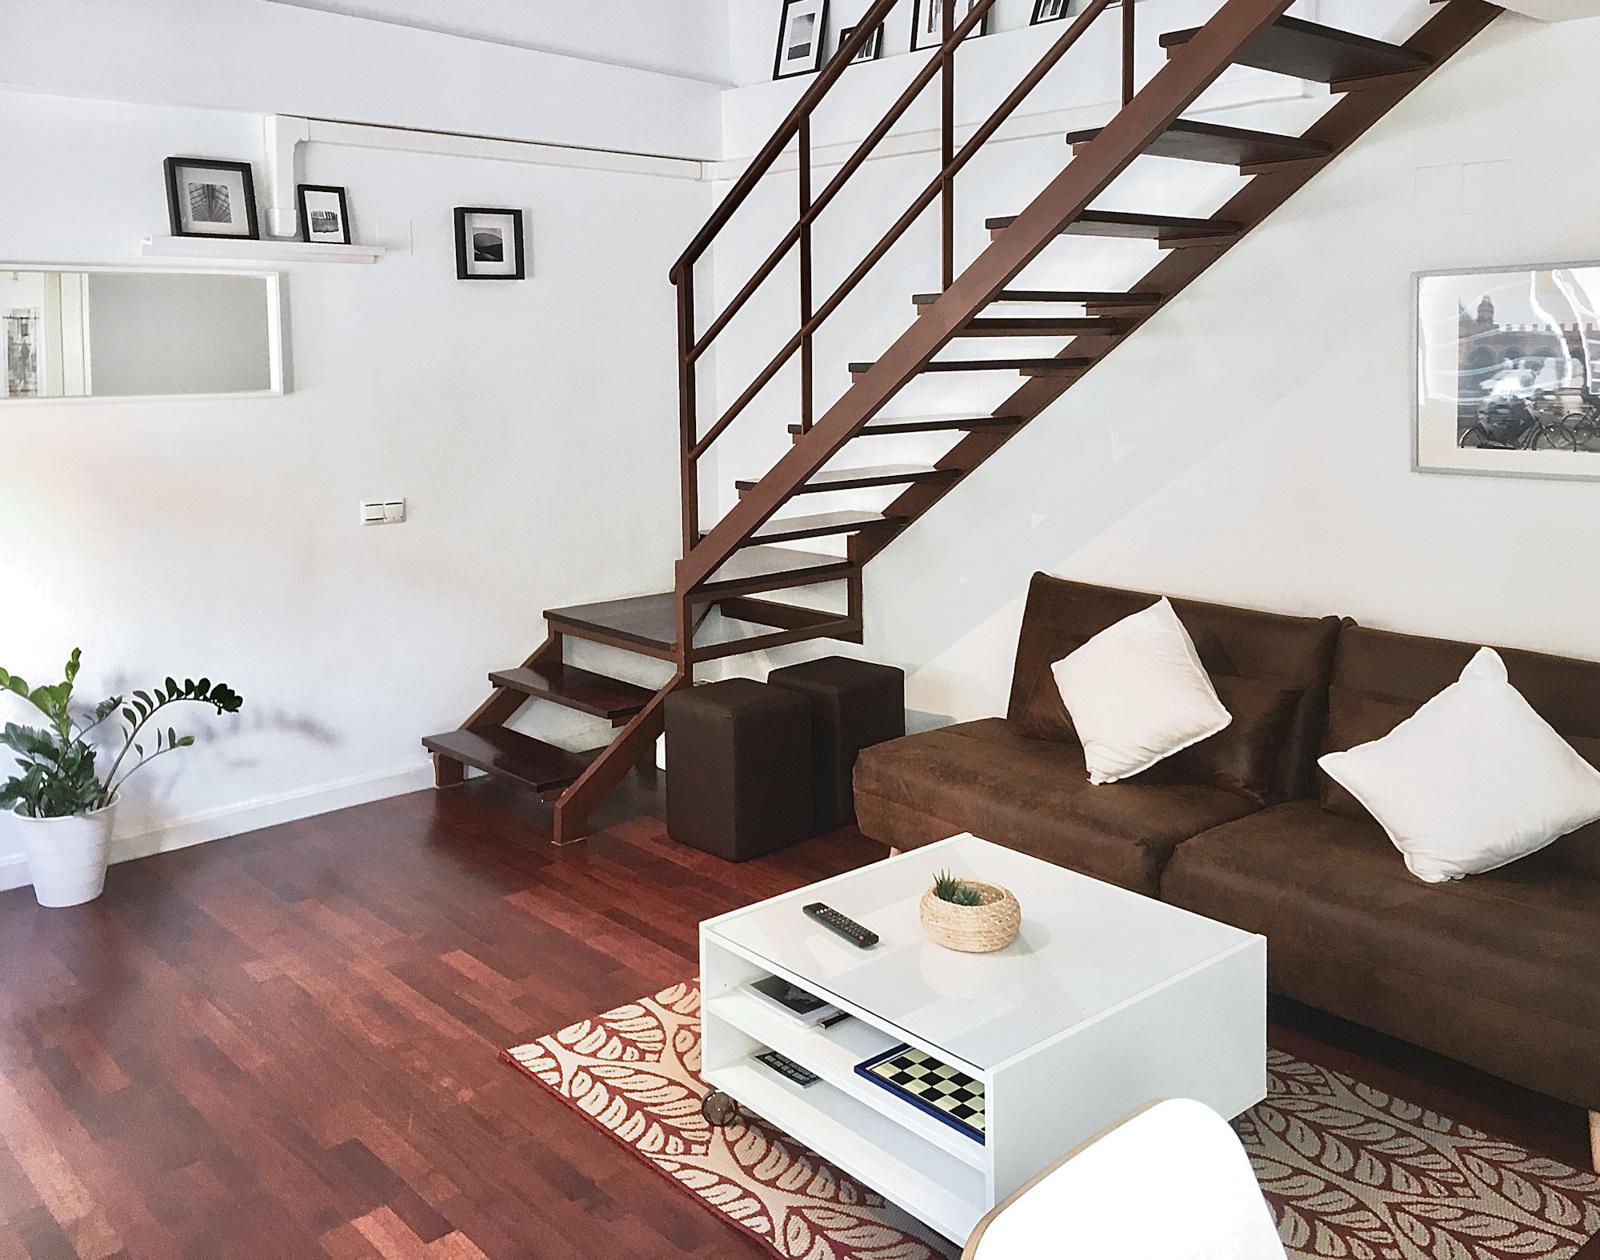 Holiday rental apartaments in Málaga. Apartments in the city center and El Palo beach. The best location in Málaga. - Duplex Centro con parking gratis